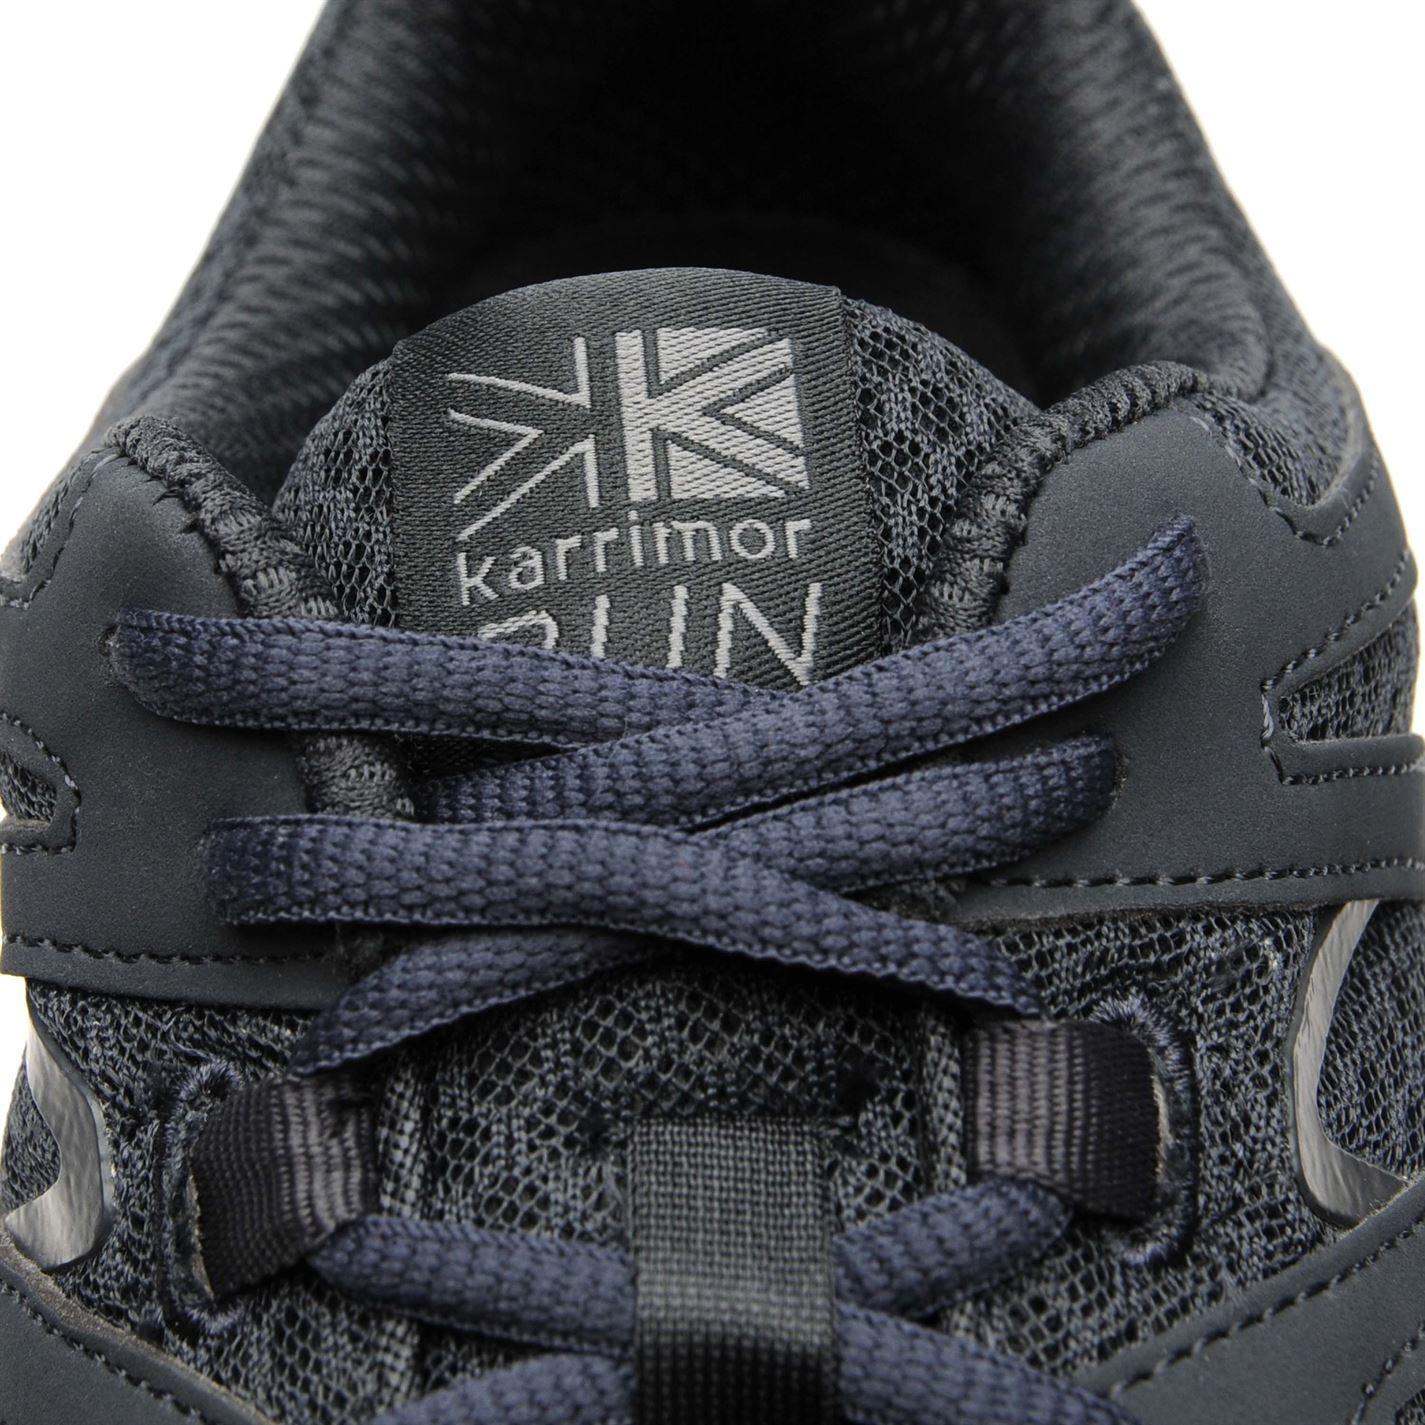 Karrimor-Mens-Duma-Trainers-Lace-Up-Sports-Running-Cross-Training-Shoes thumbnail 15